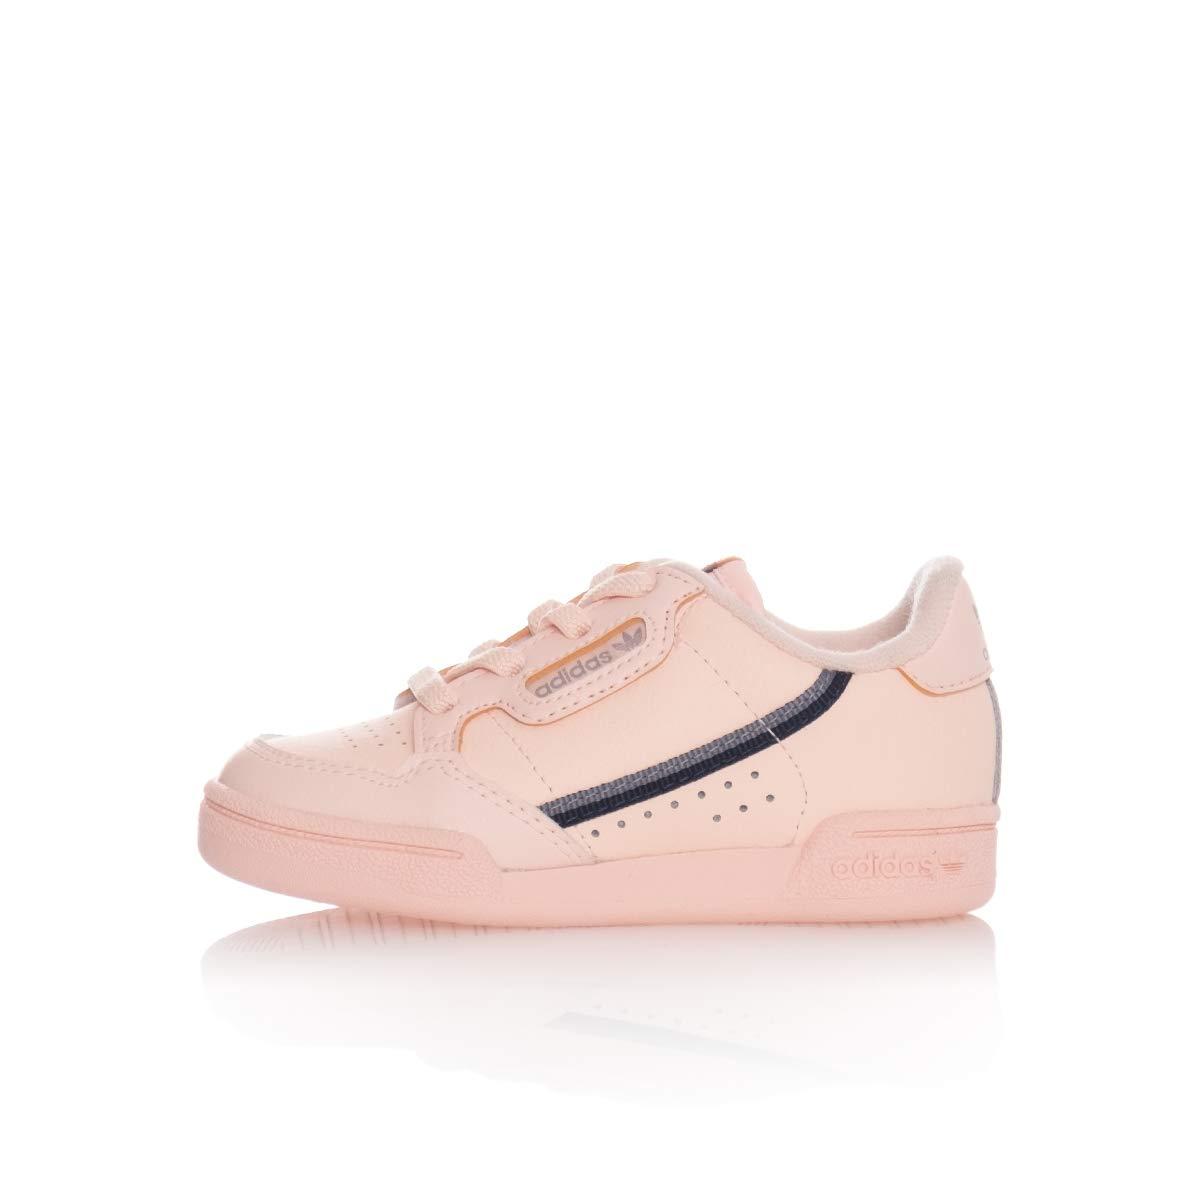 adidas Scarpe Continental 80 J Bianco 38 23: Amazon.it